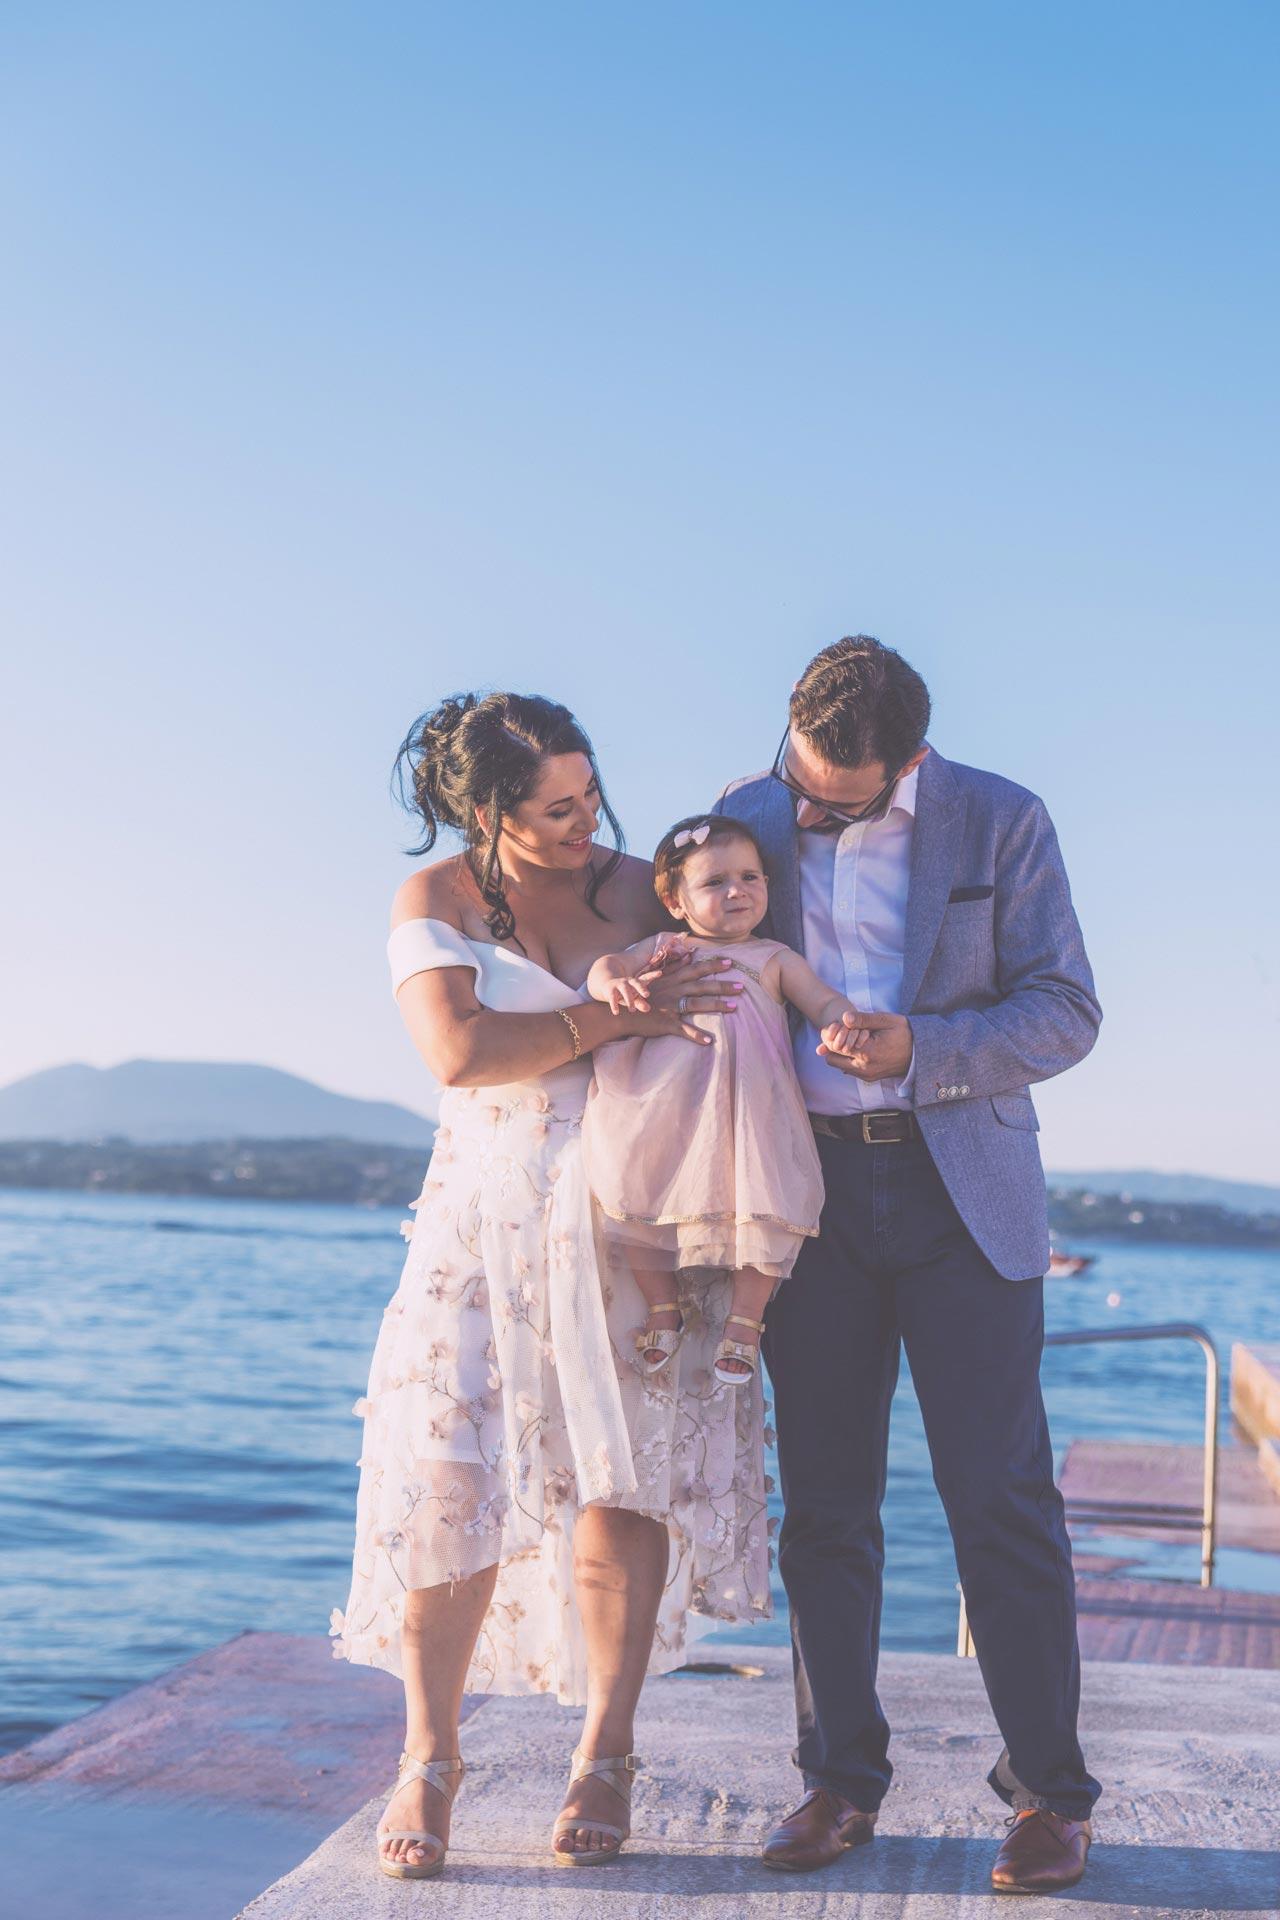 067 PhotoVaptisis Spetses vaptisi βαπτιση μωρο βαπτιστικά βαπριση σπετσες αγιος μαμας διακοσμηση βάπτισης γονείς νονά